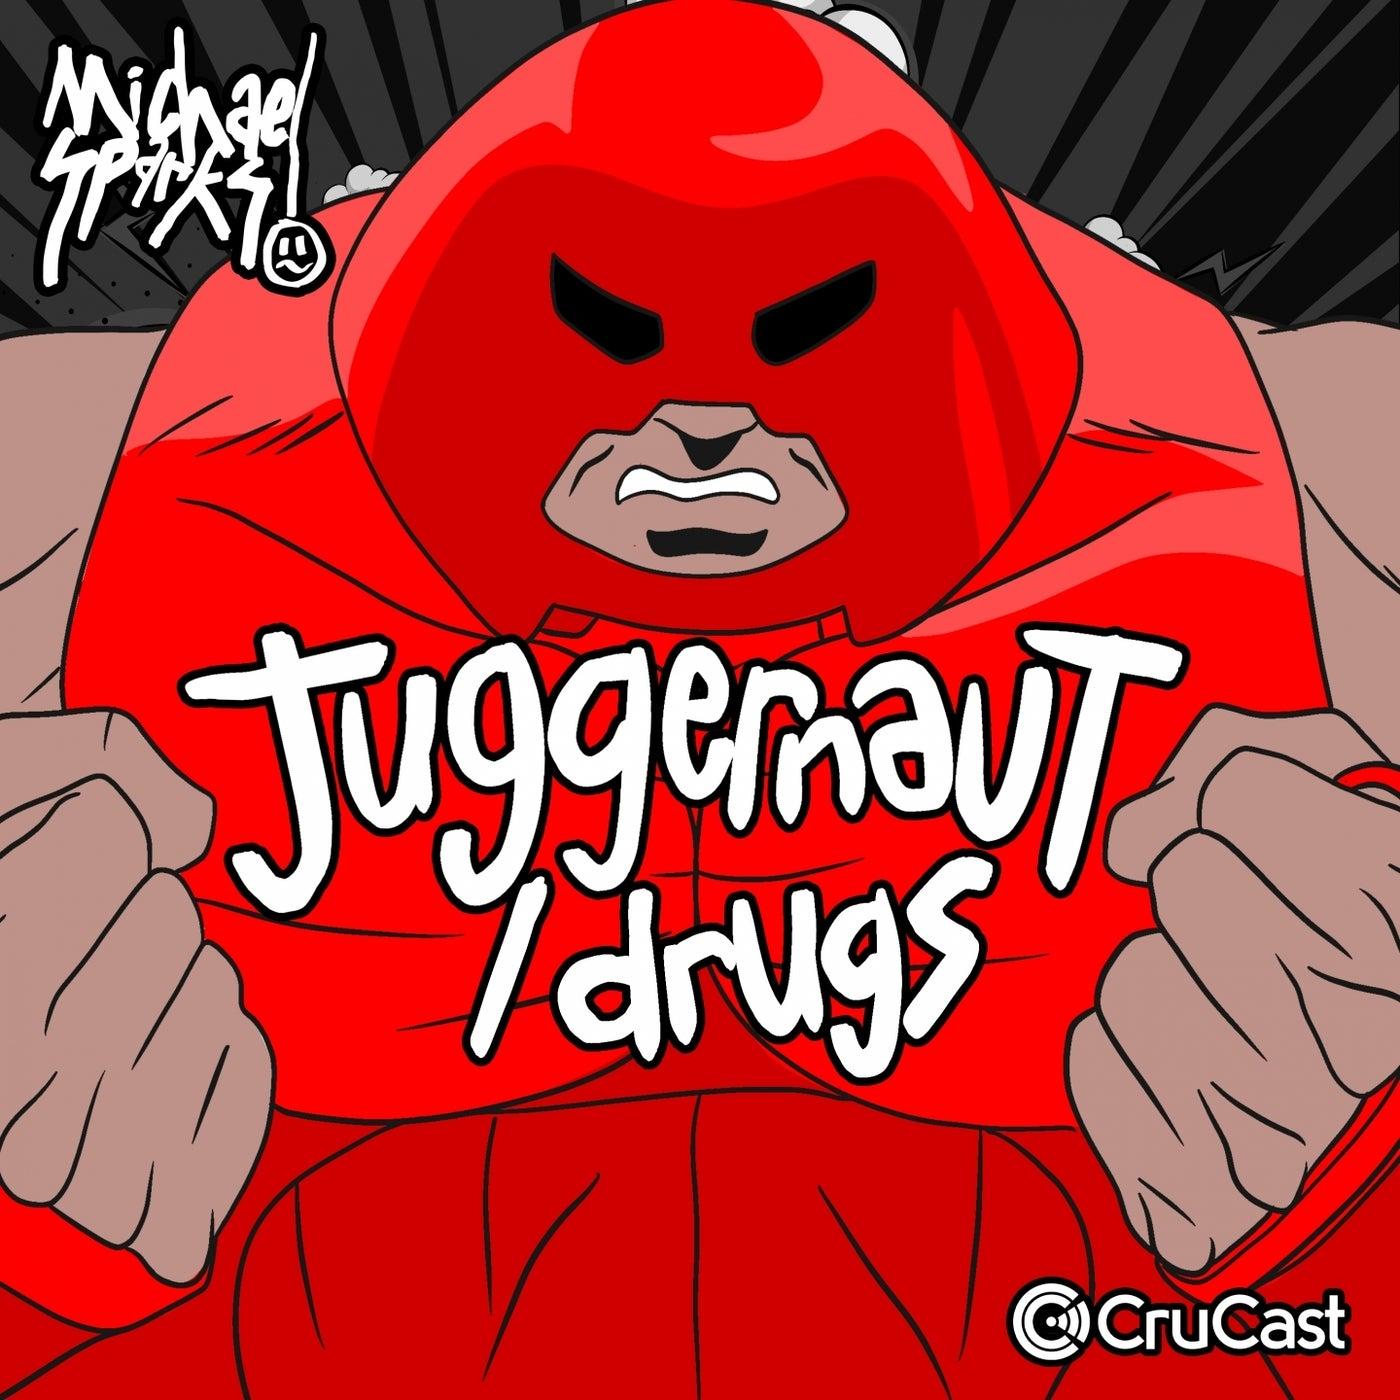 Juggernaut (Original Mix)